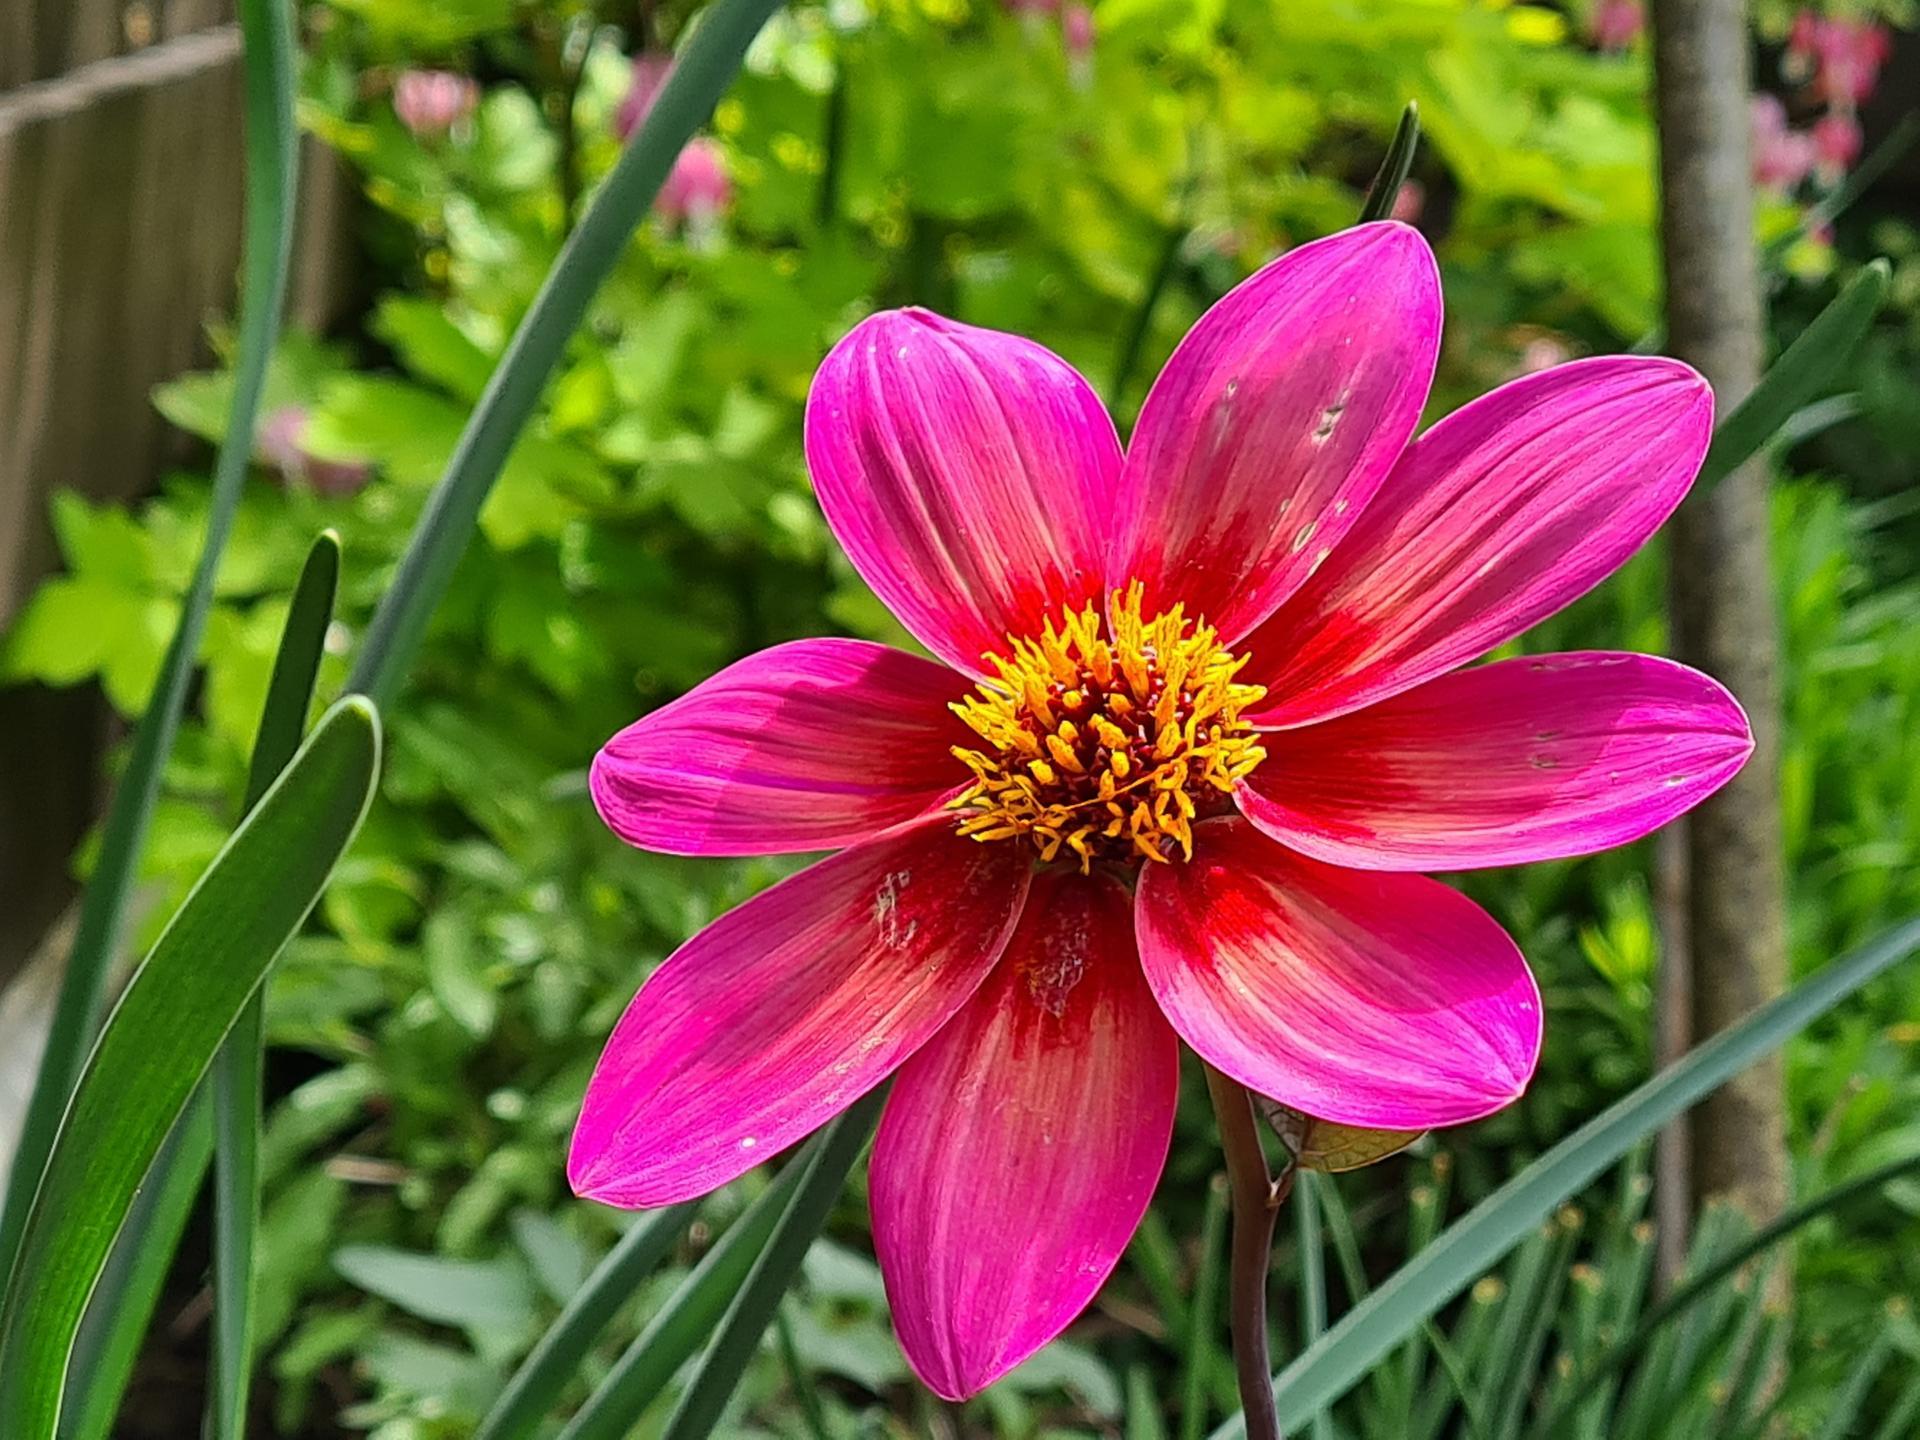 Naša záhradka 2021 - Jirinka sa rozkvitla, snad mi ju nezozeru slimaky...